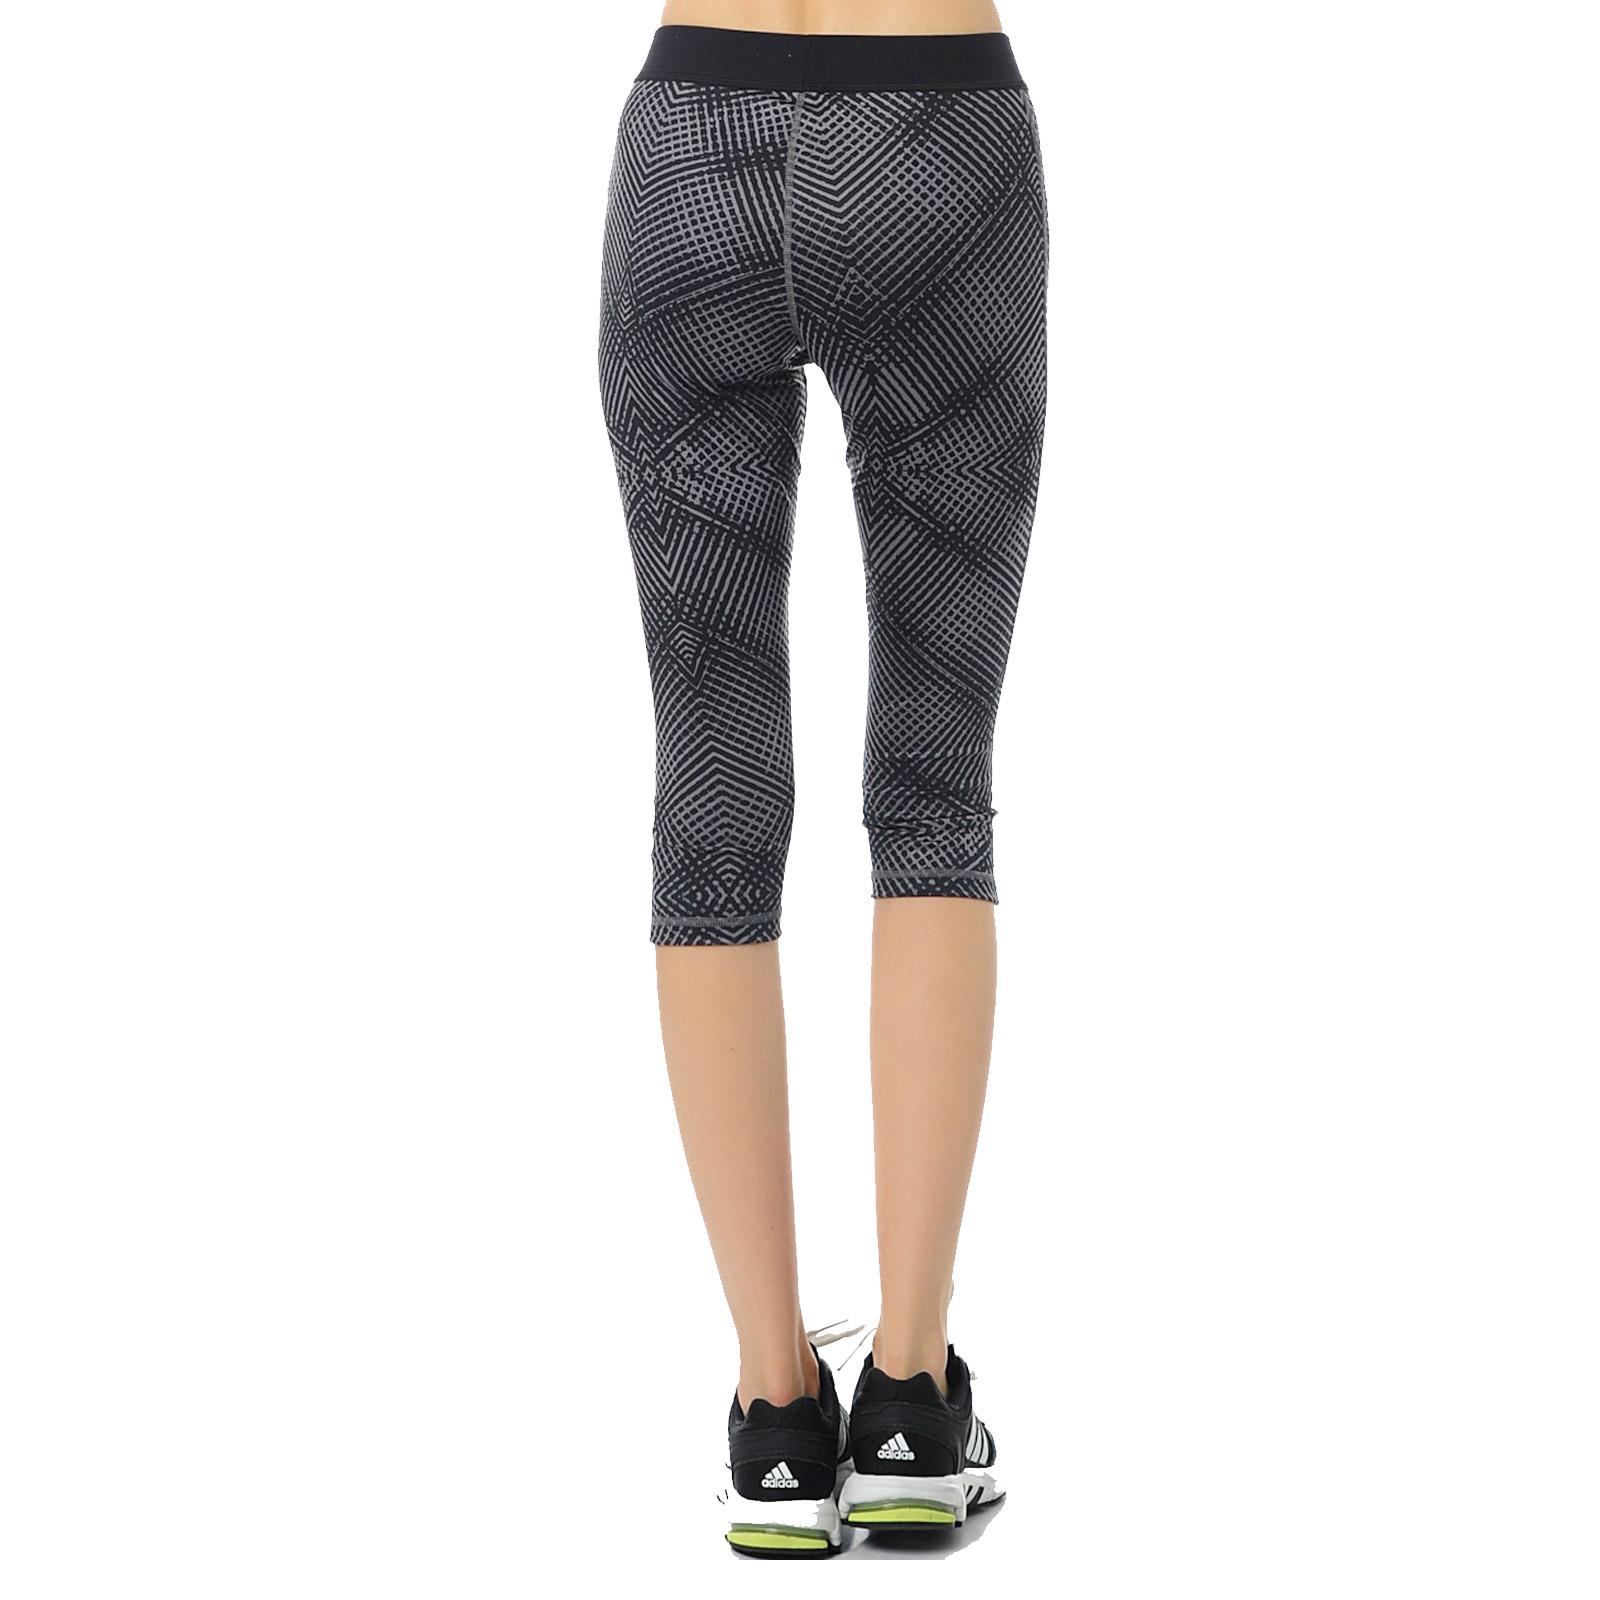 adidas performance womens techfit capri 3 4 global training gym leggings pants ebay. Black Bedroom Furniture Sets. Home Design Ideas